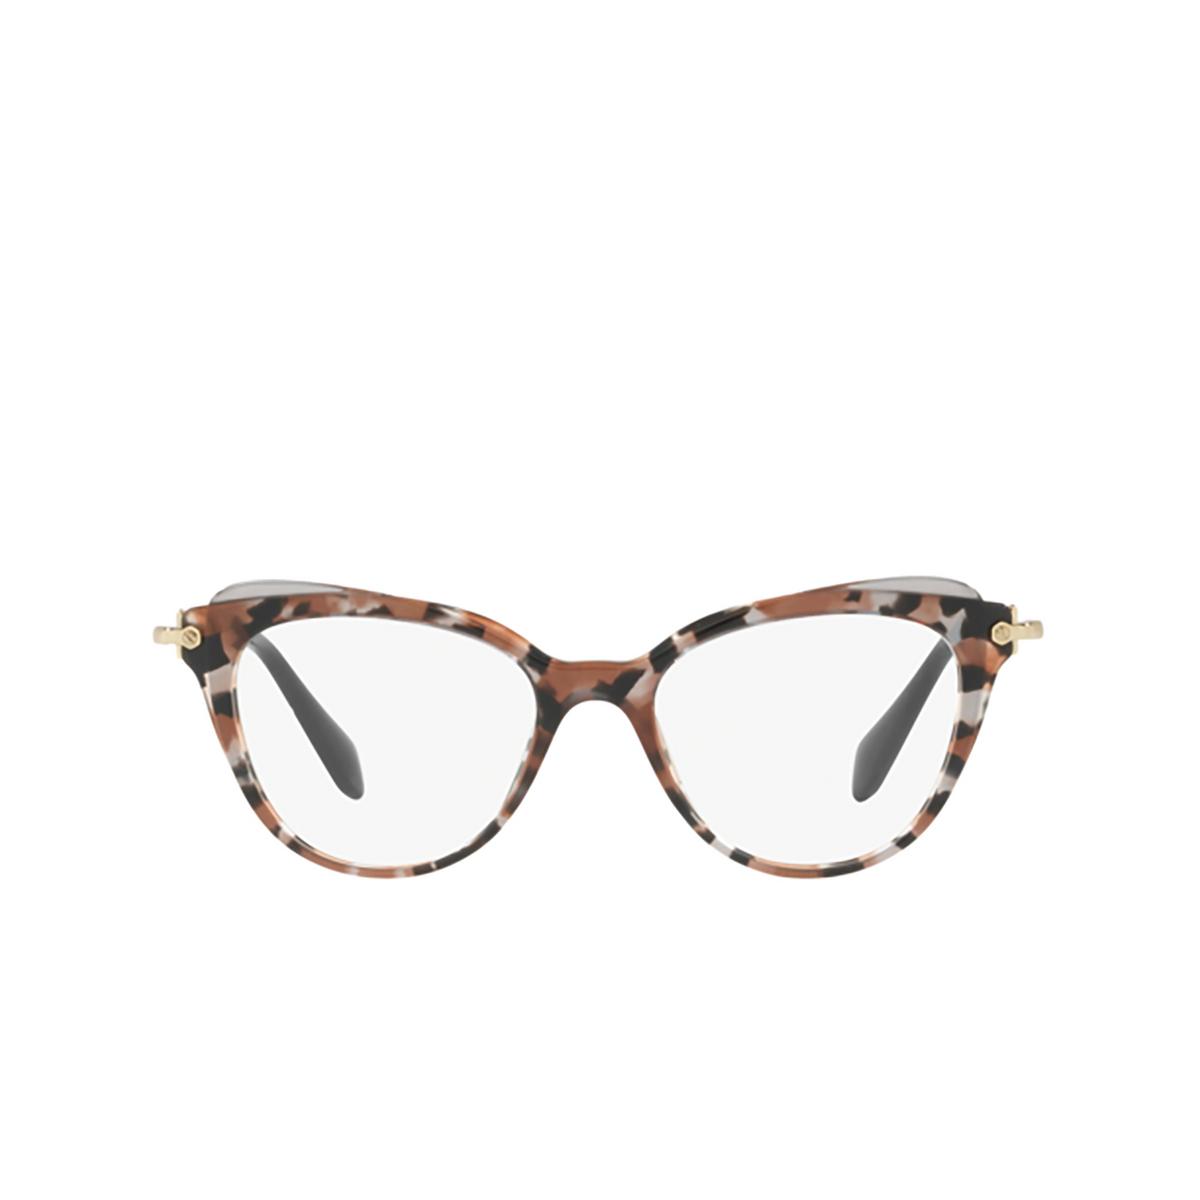 Miu Miu® Cat-eye Eyeglasses: MU 01QV color Grey Havana / Cocoa / Grey Transp 1111O1 - front view.